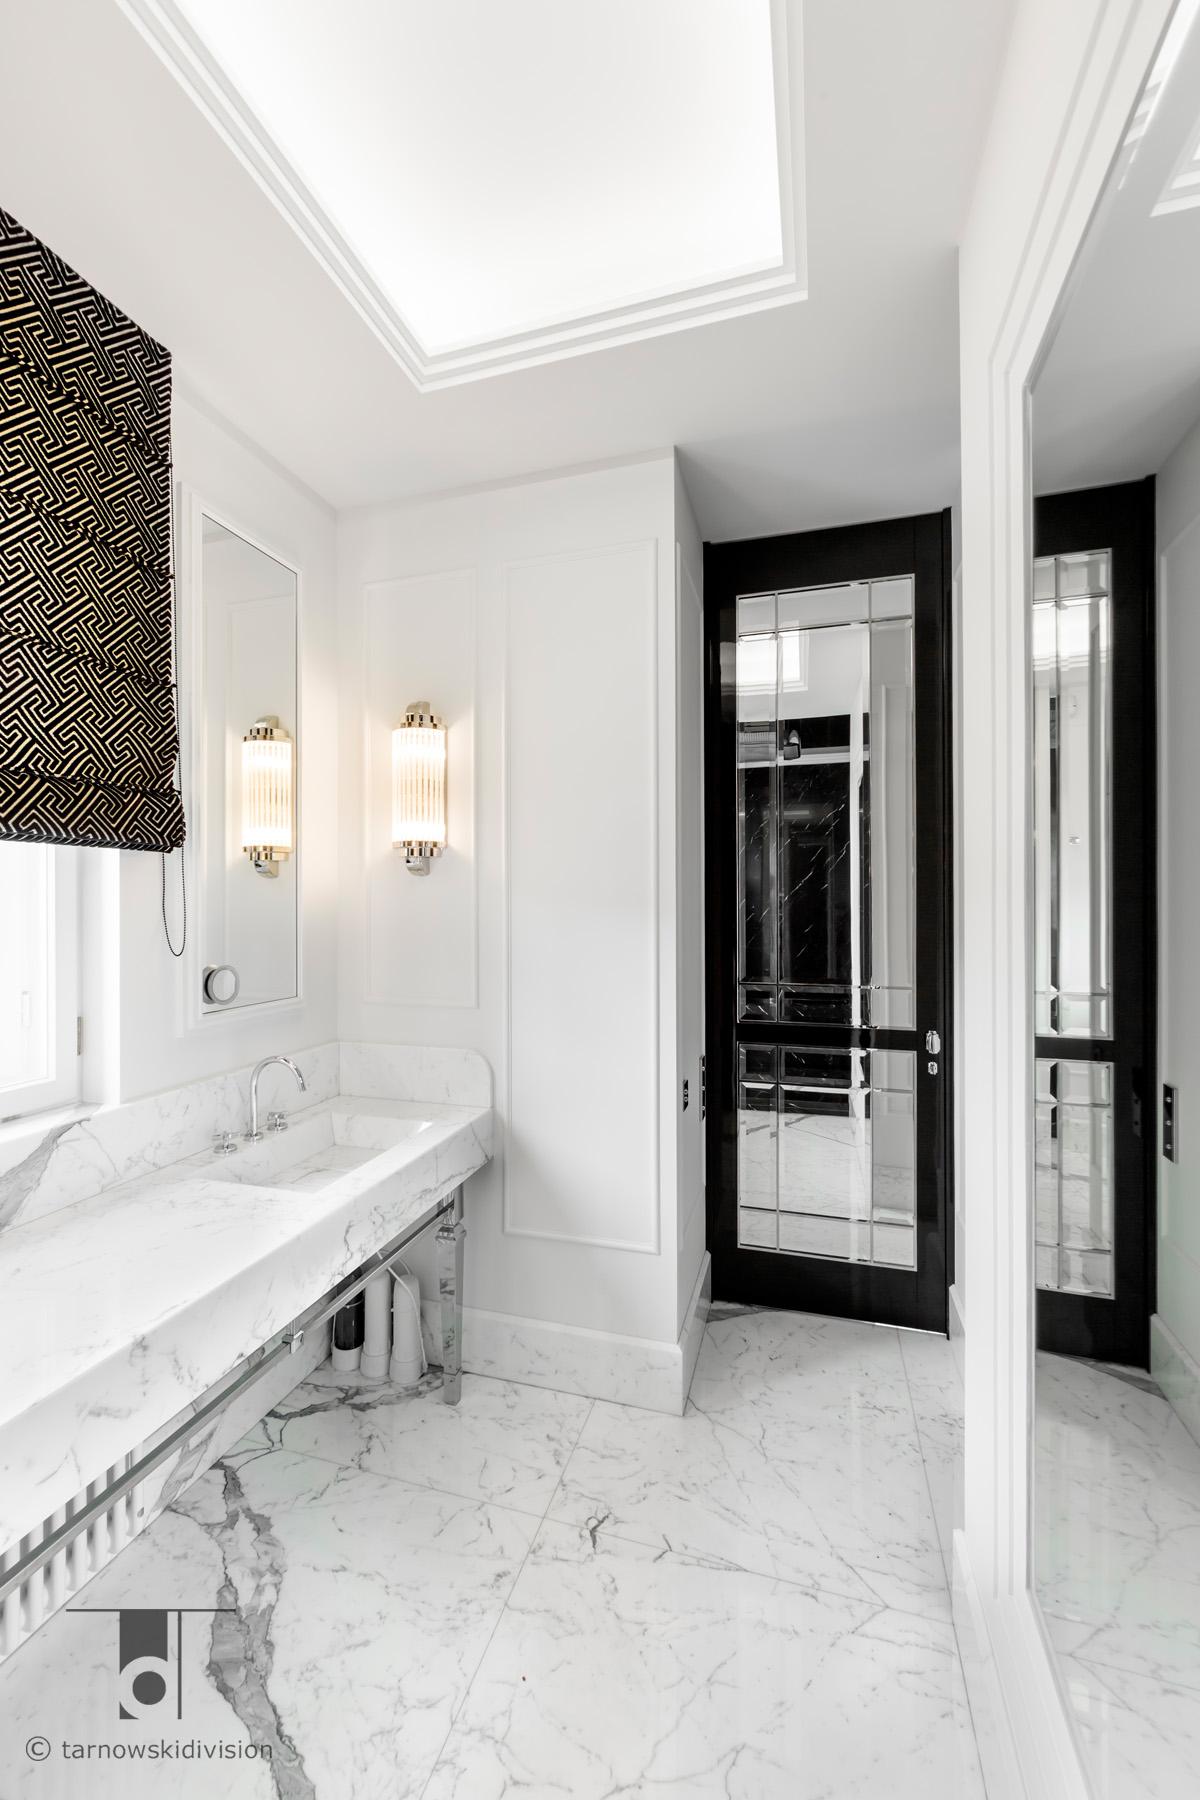 elegancka klasyczna łazienka umywalka z marmuru pokój kąpielowy marble basin bathroom interior_tarnowski division